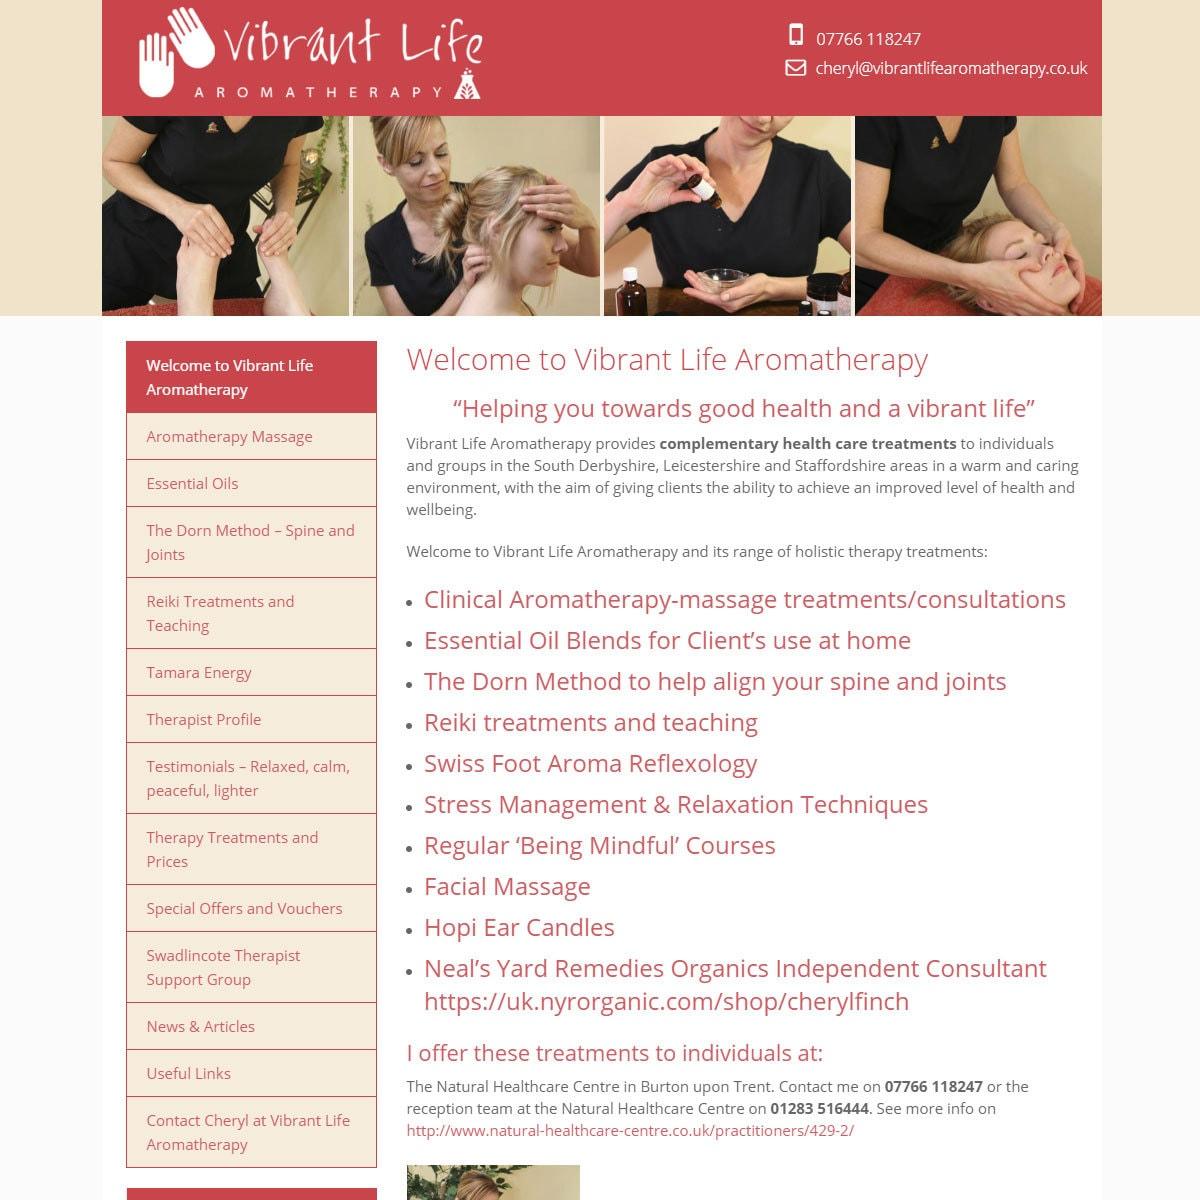 vibrantlifearomatherapy